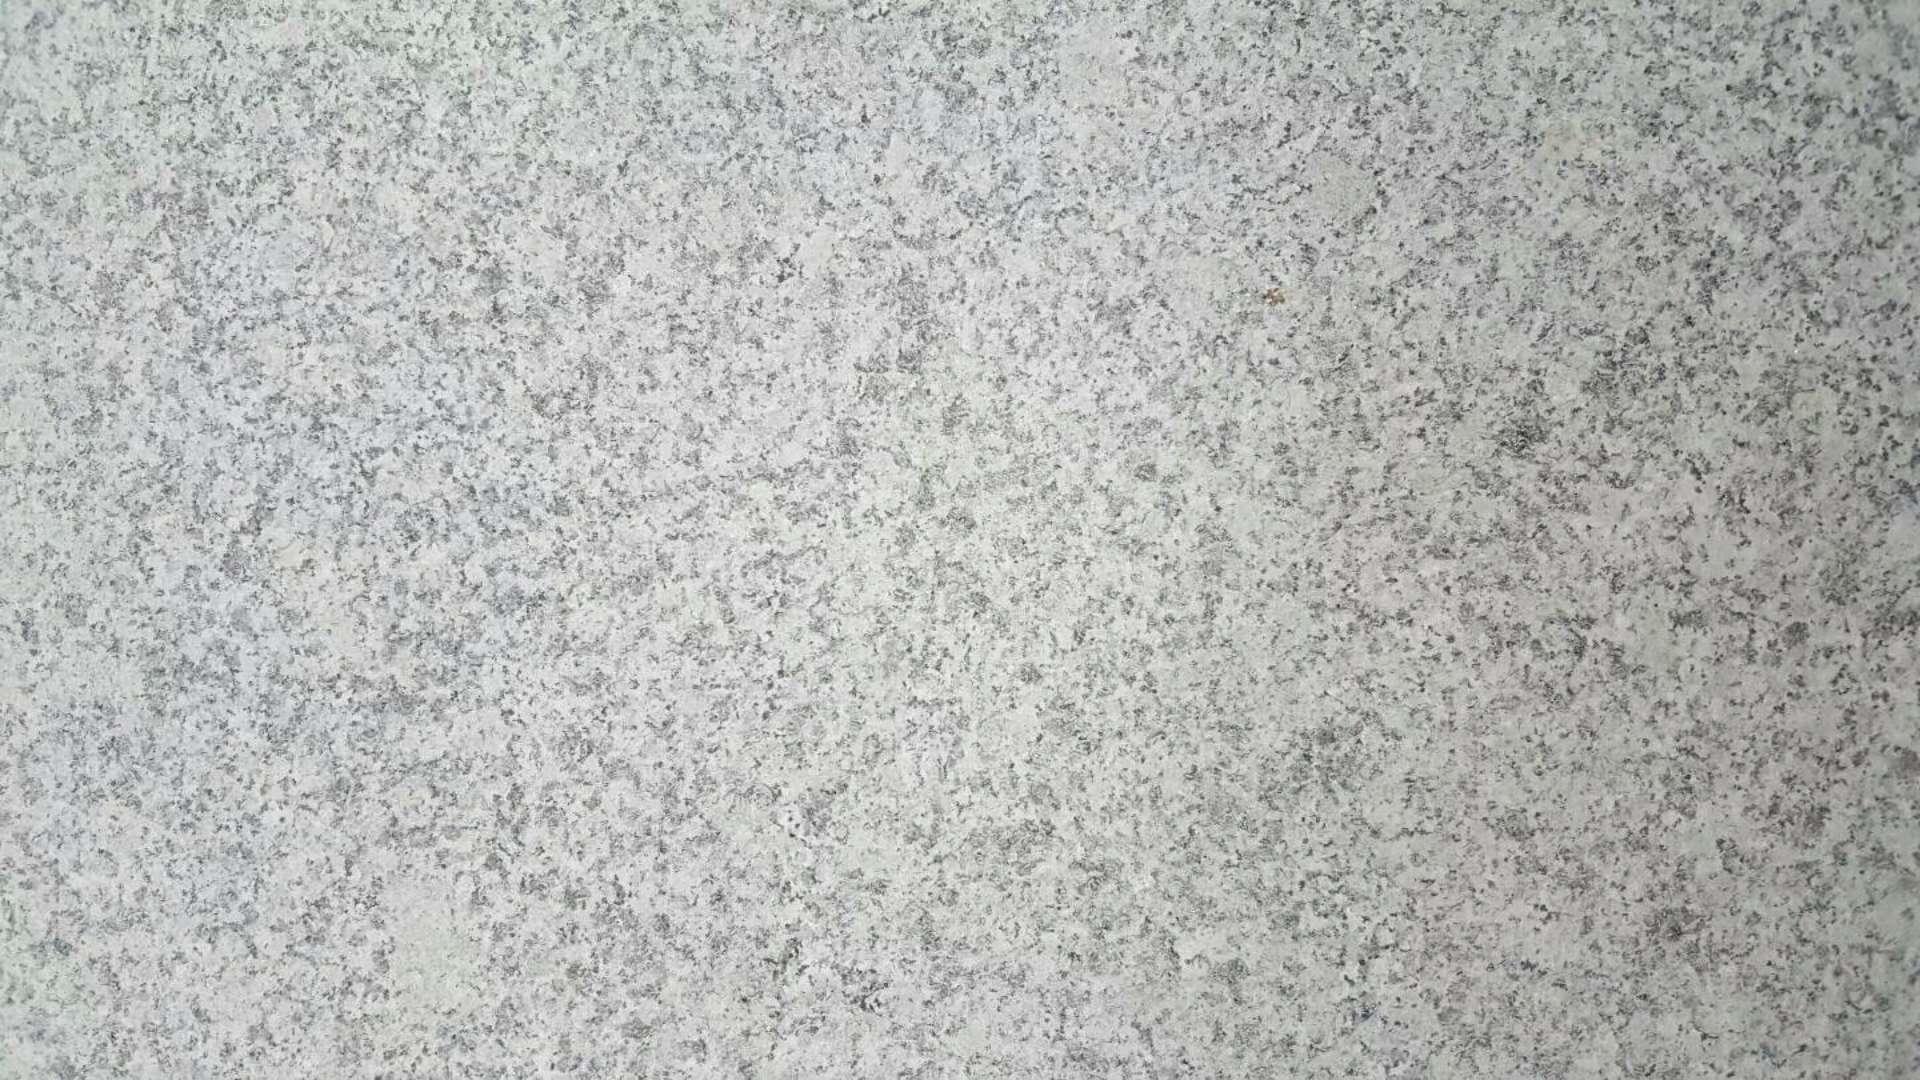 G603 building materias granite G633 G654 culture stone